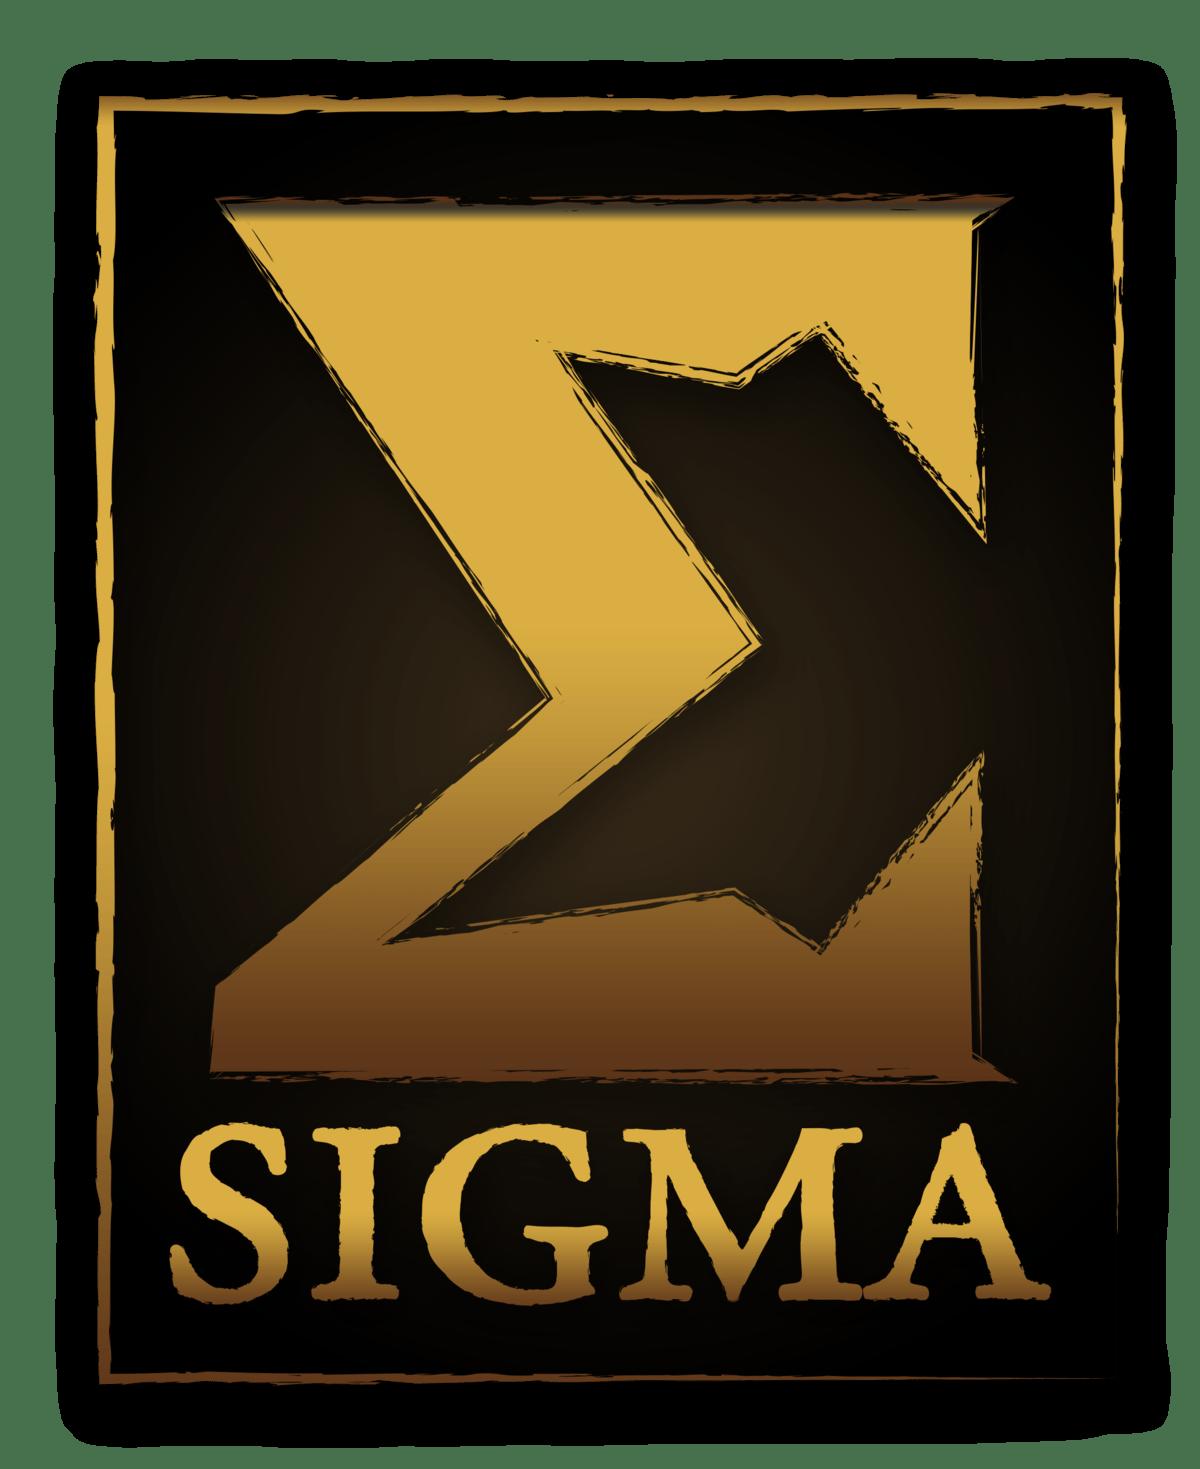 Sigma Dota 2 Wiki